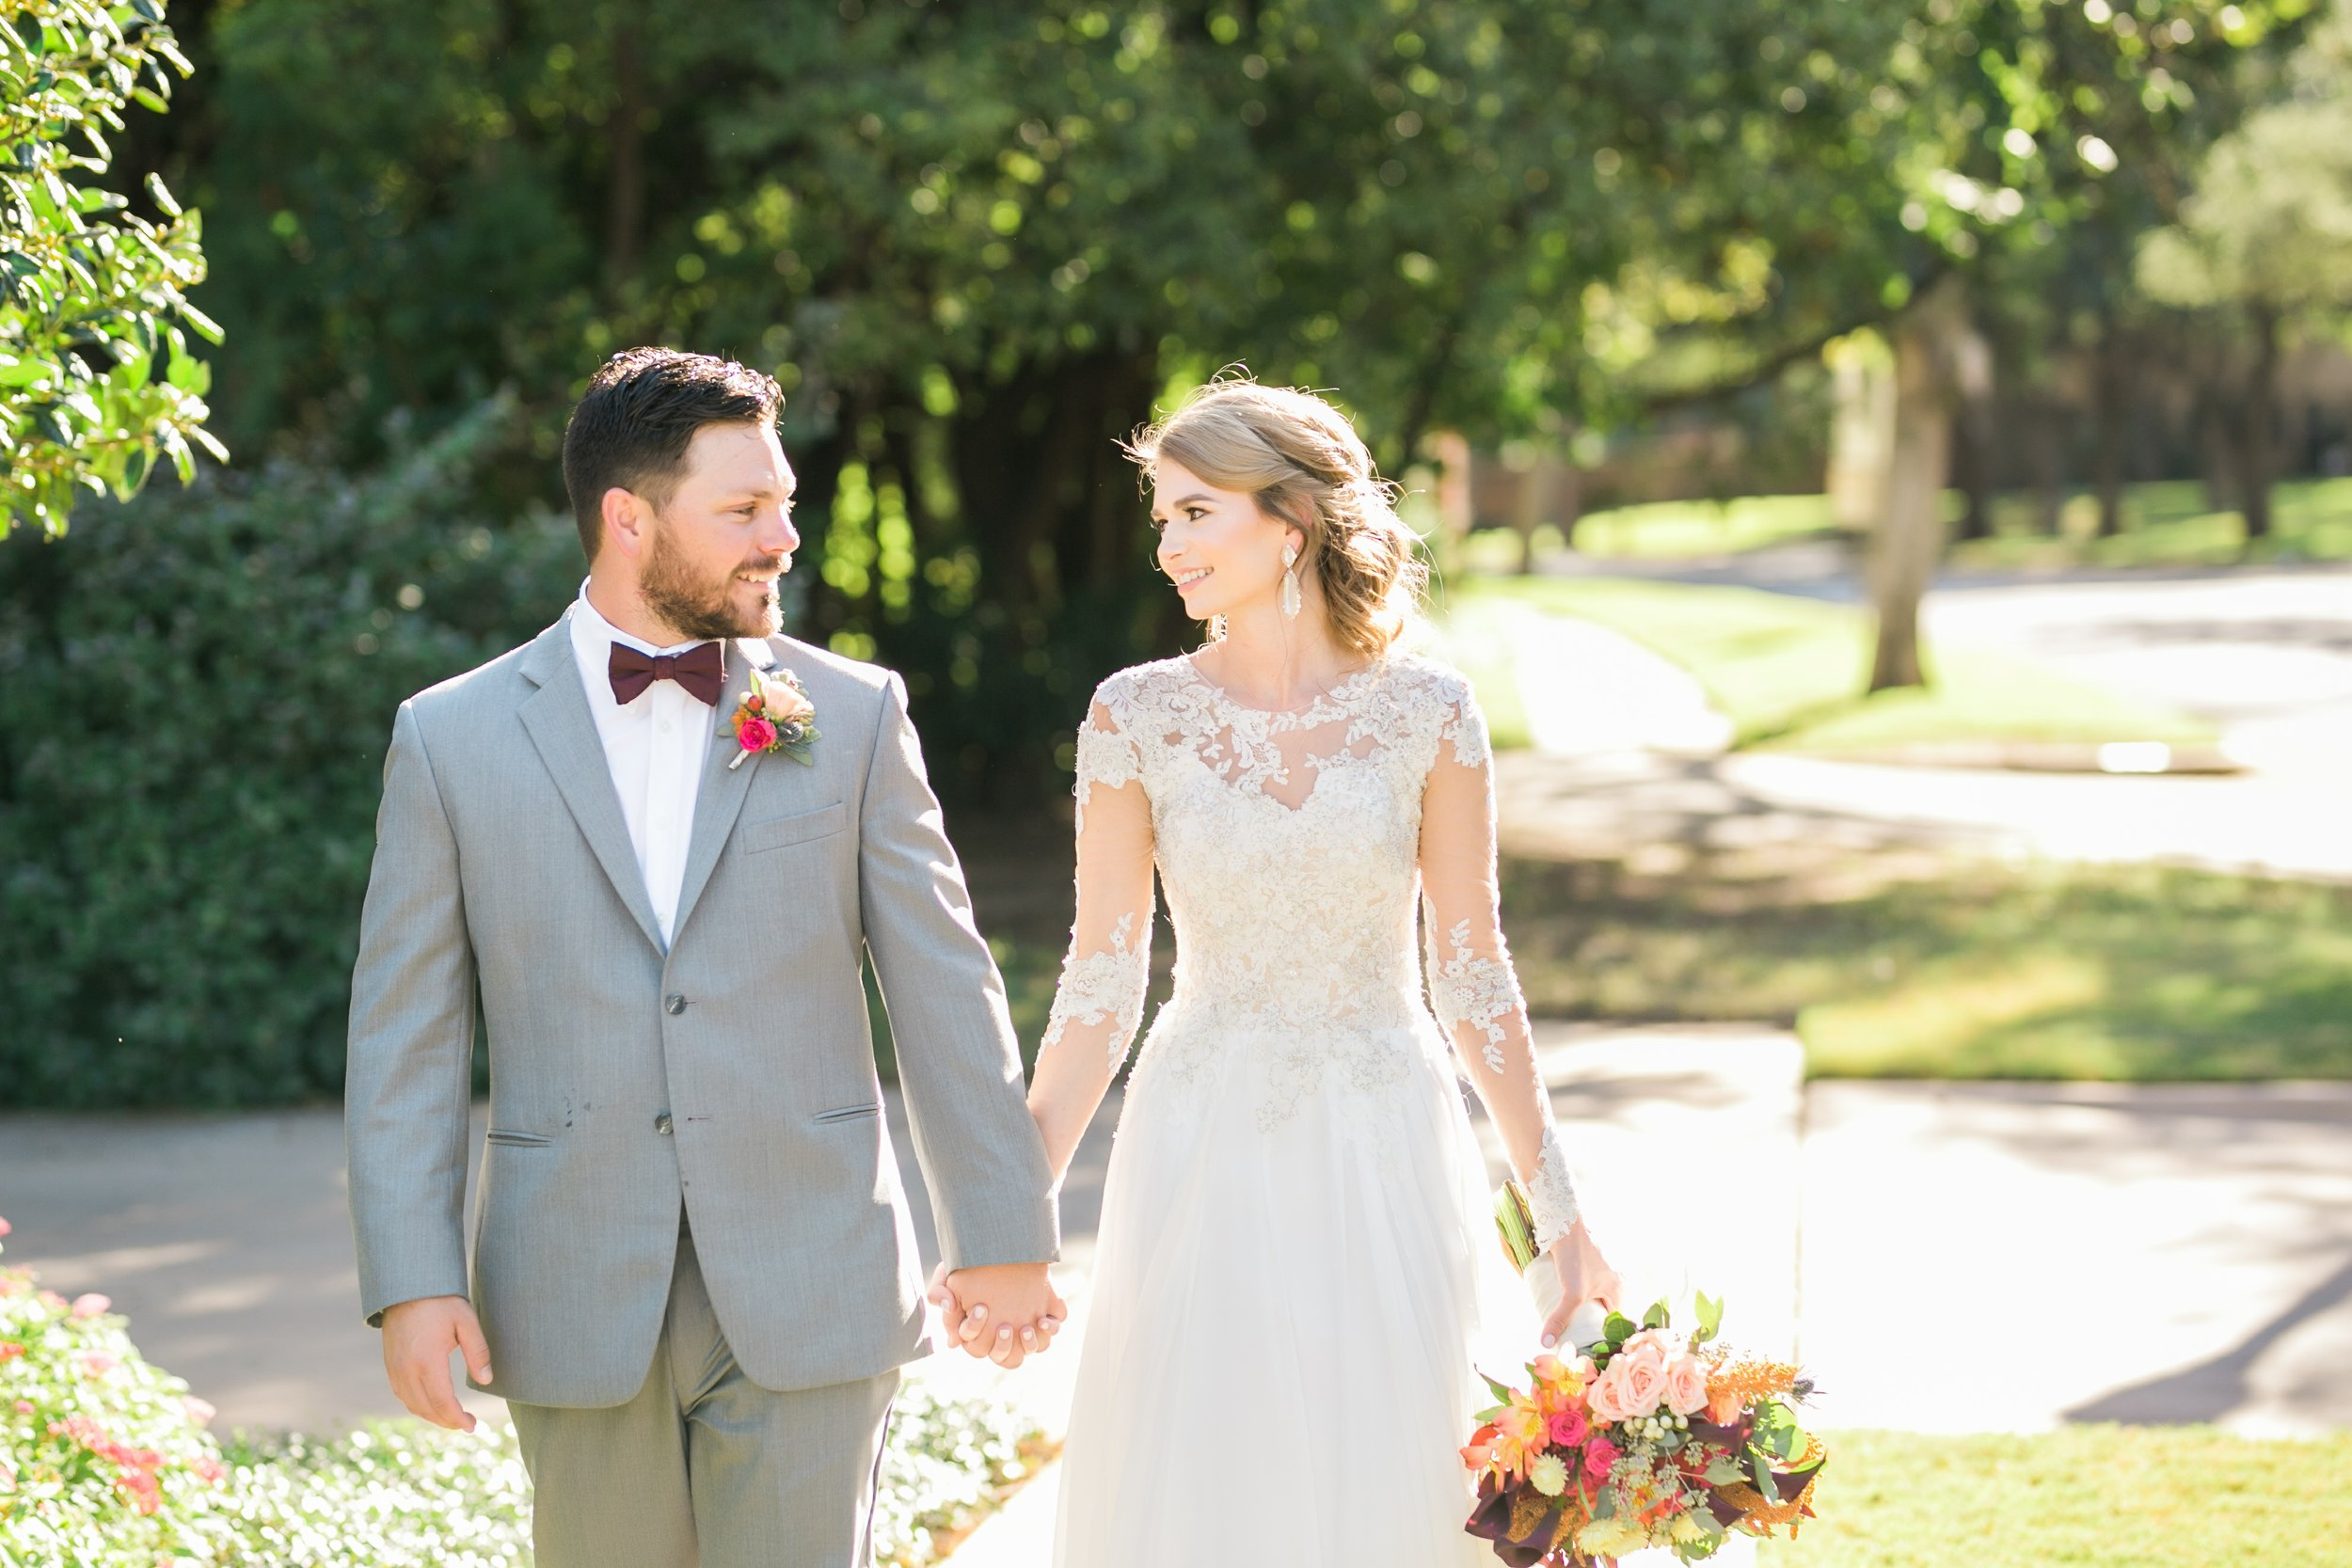 Roberson-Wedding-The-Forum-Lauren-Pinson-Wedding-Photography-Wichita-Falls-Texas-036.jpg